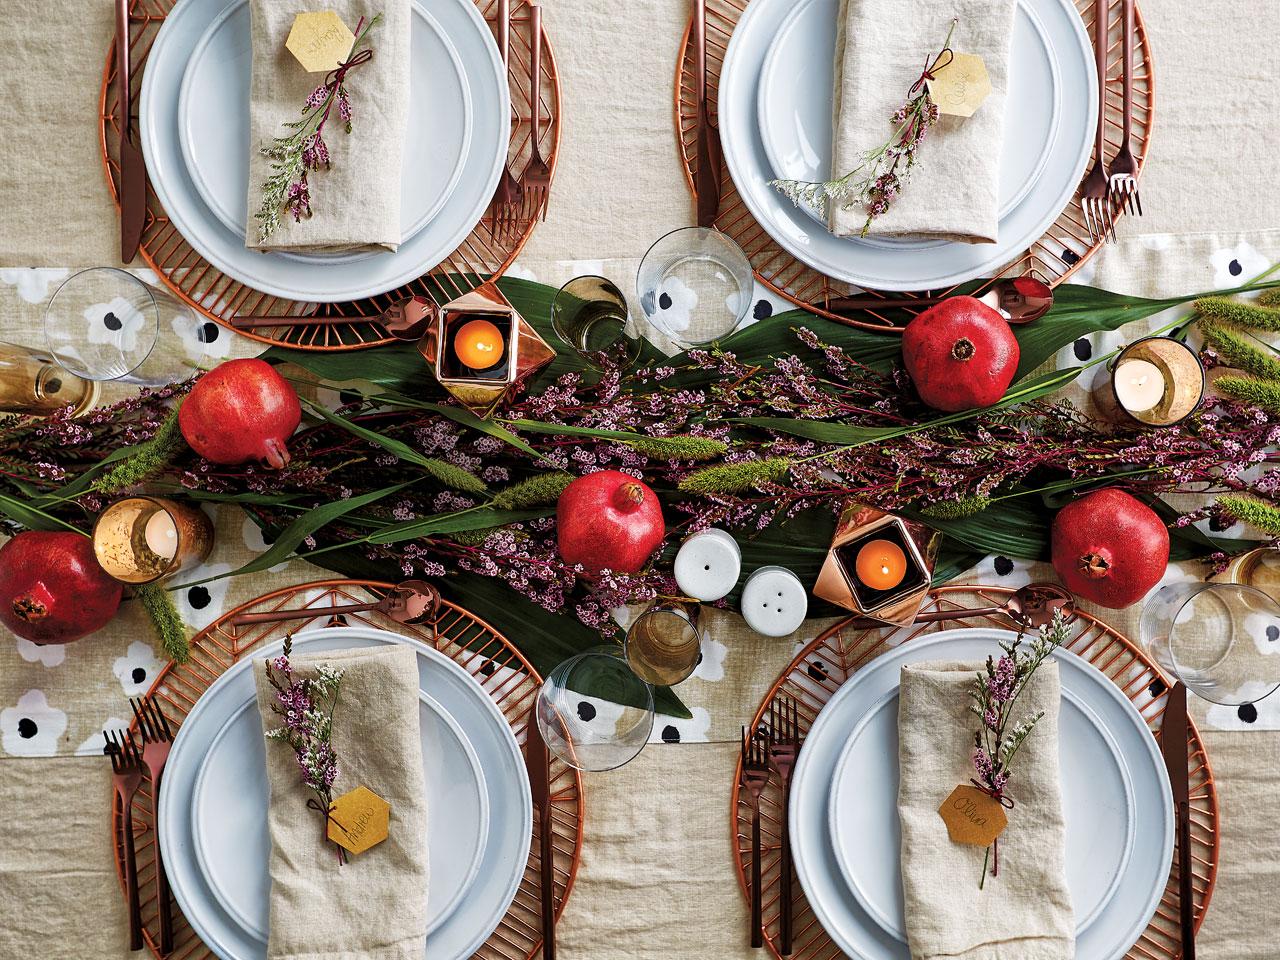 fall winter table settings-table 1